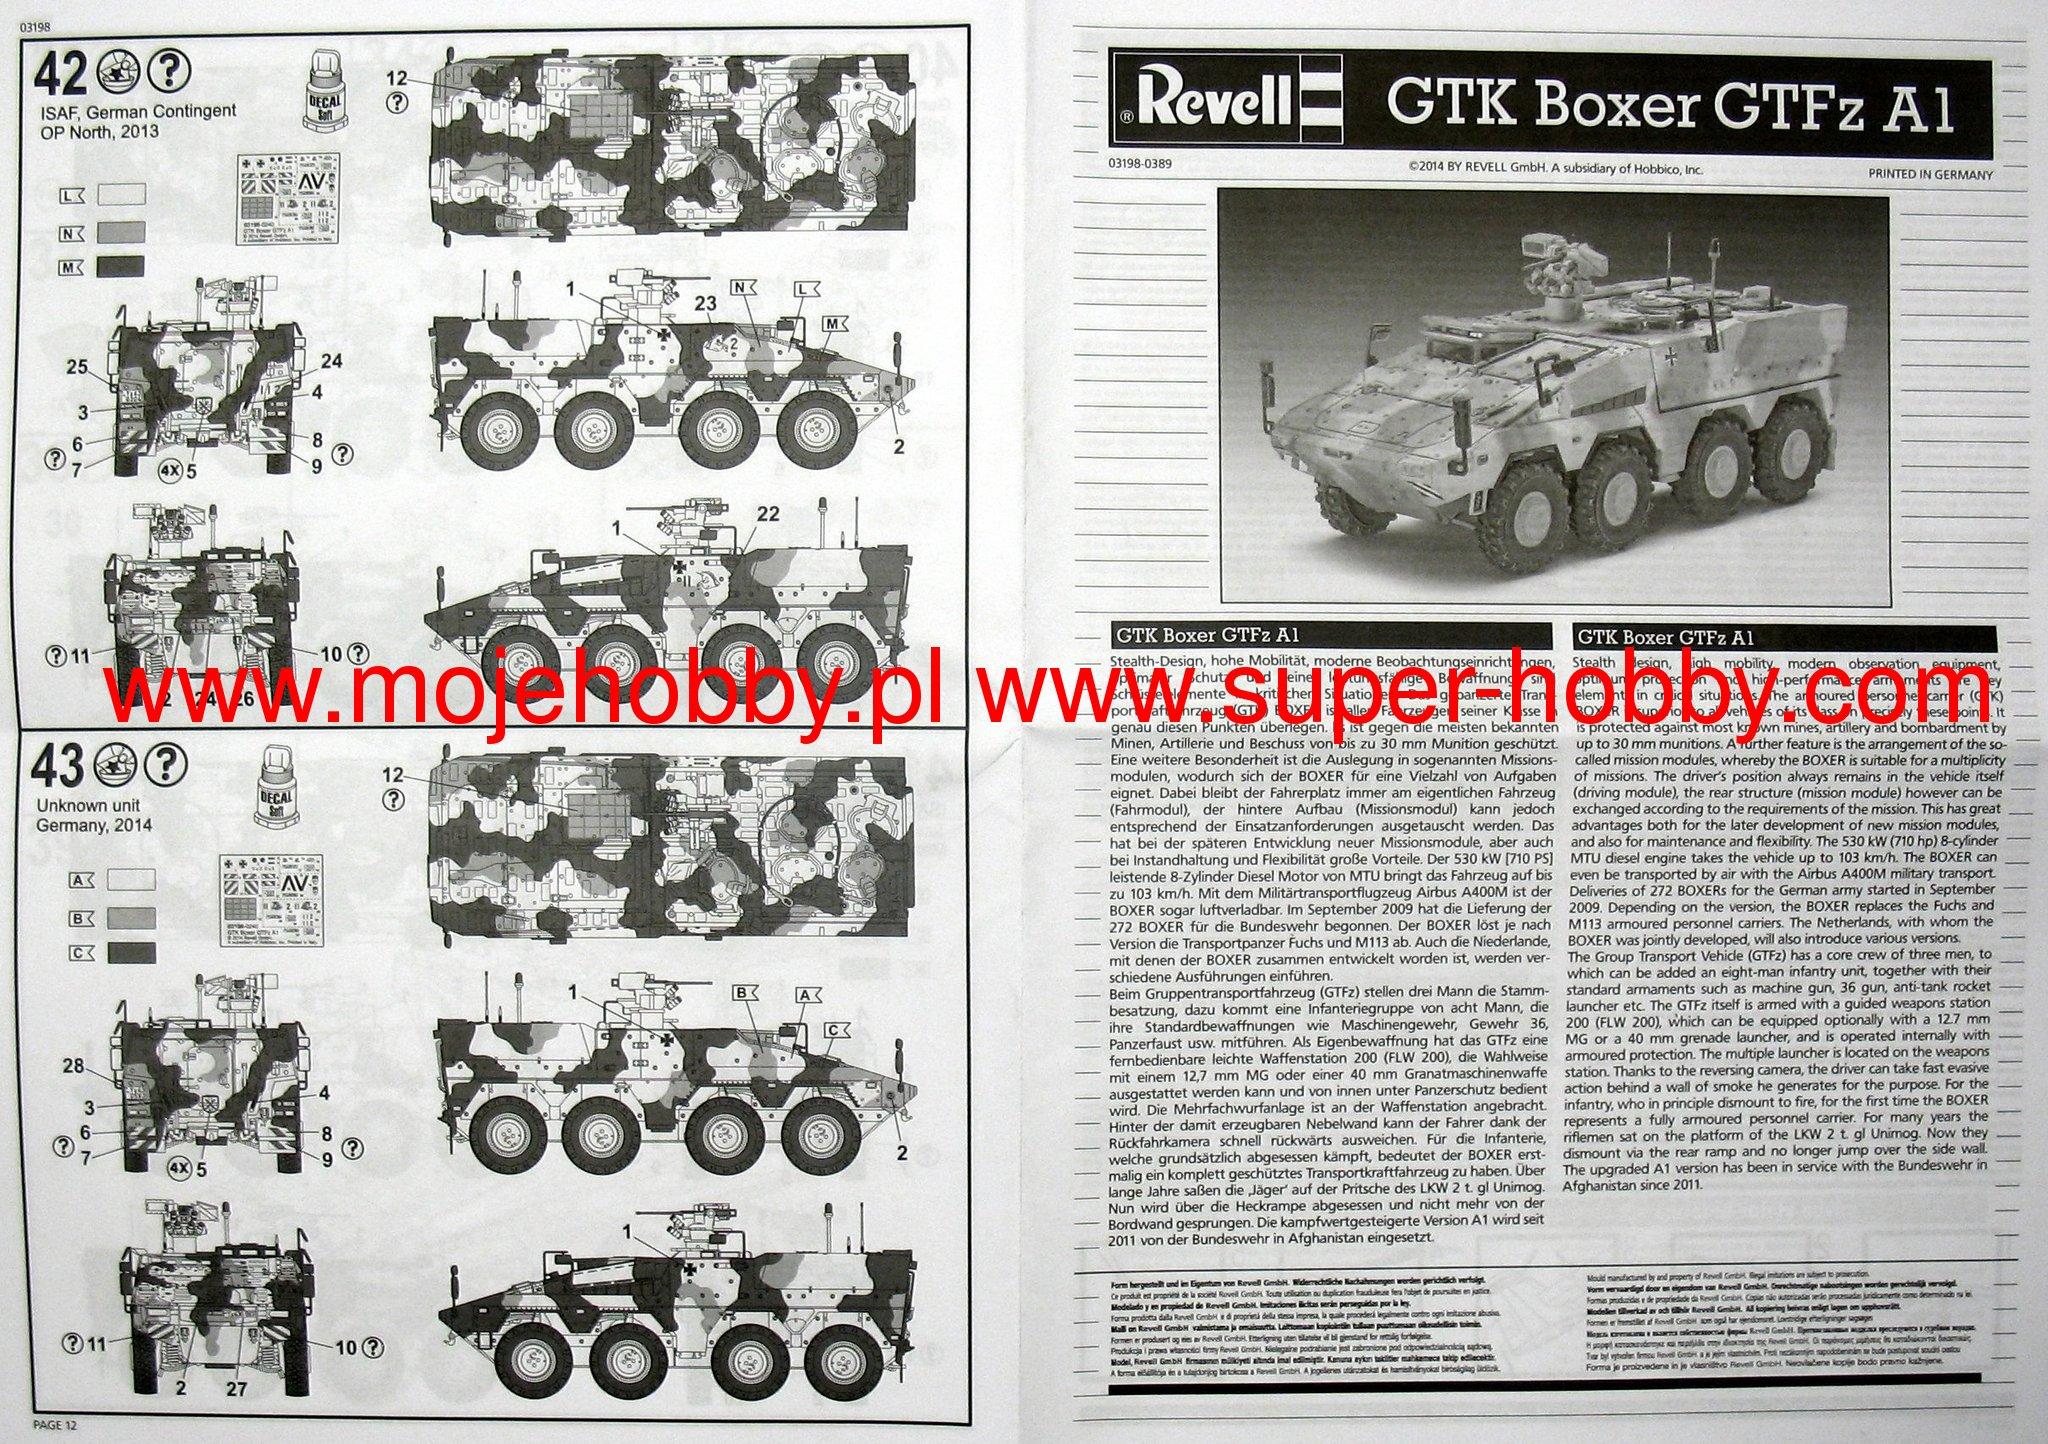 03209 Escala 1:72 Maqueta GTK Boxer F/üFz A1 Revell